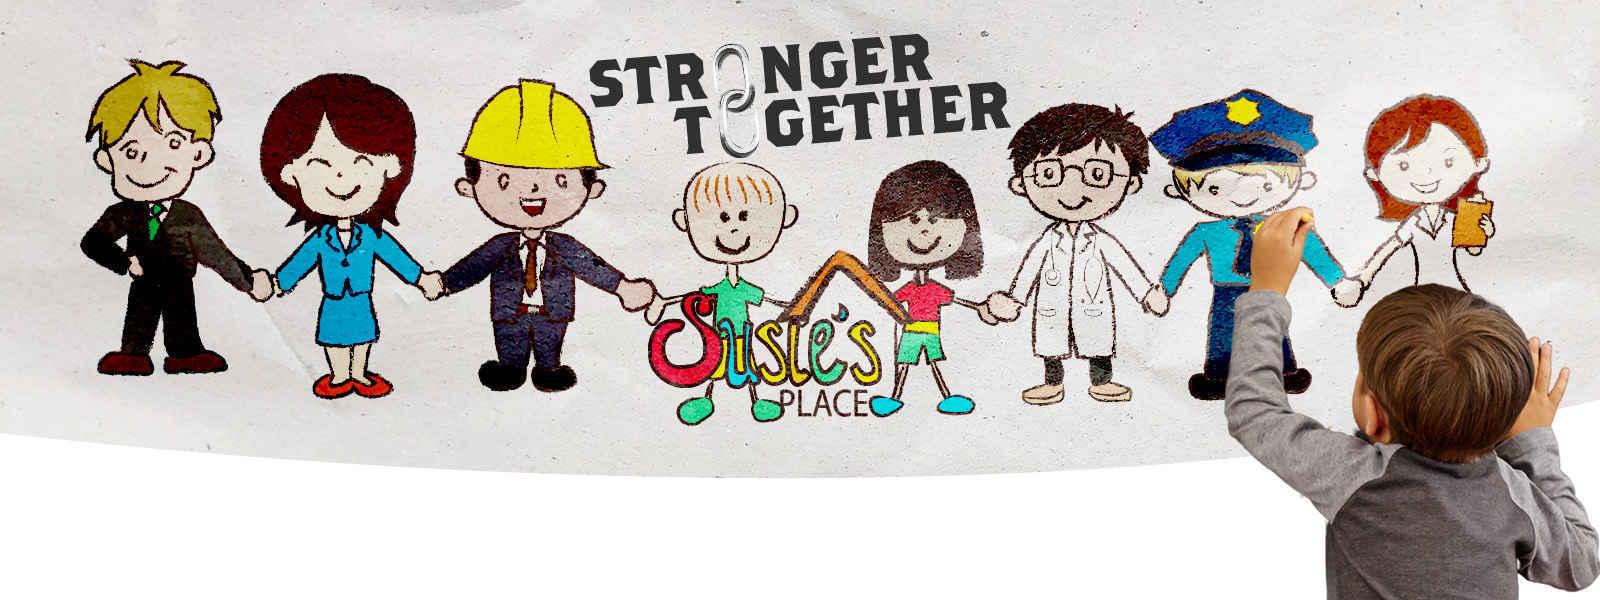 We're stronger together image